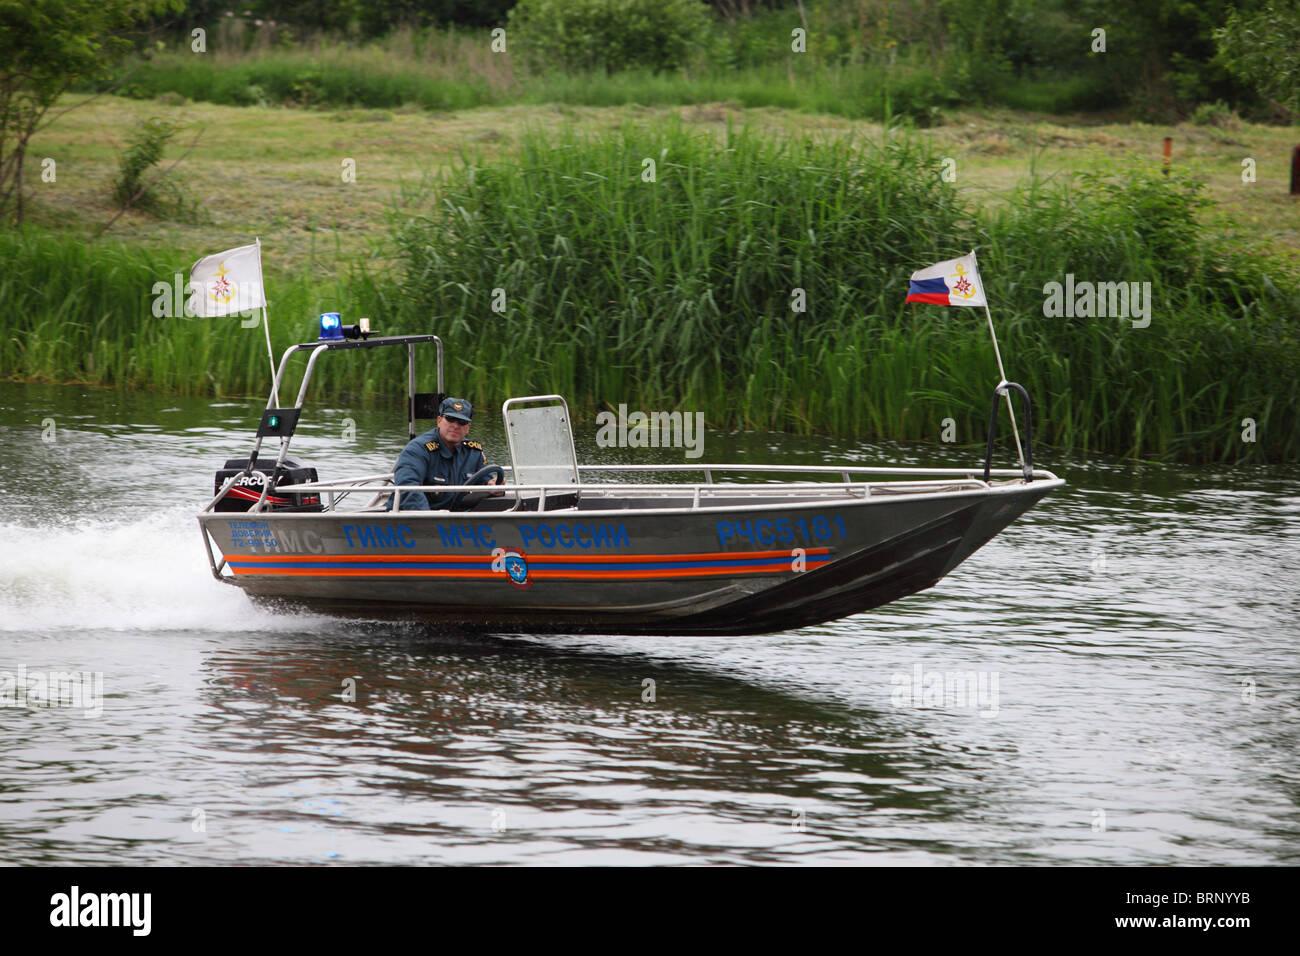 Russia, Emergencies motorboat - Stock Image